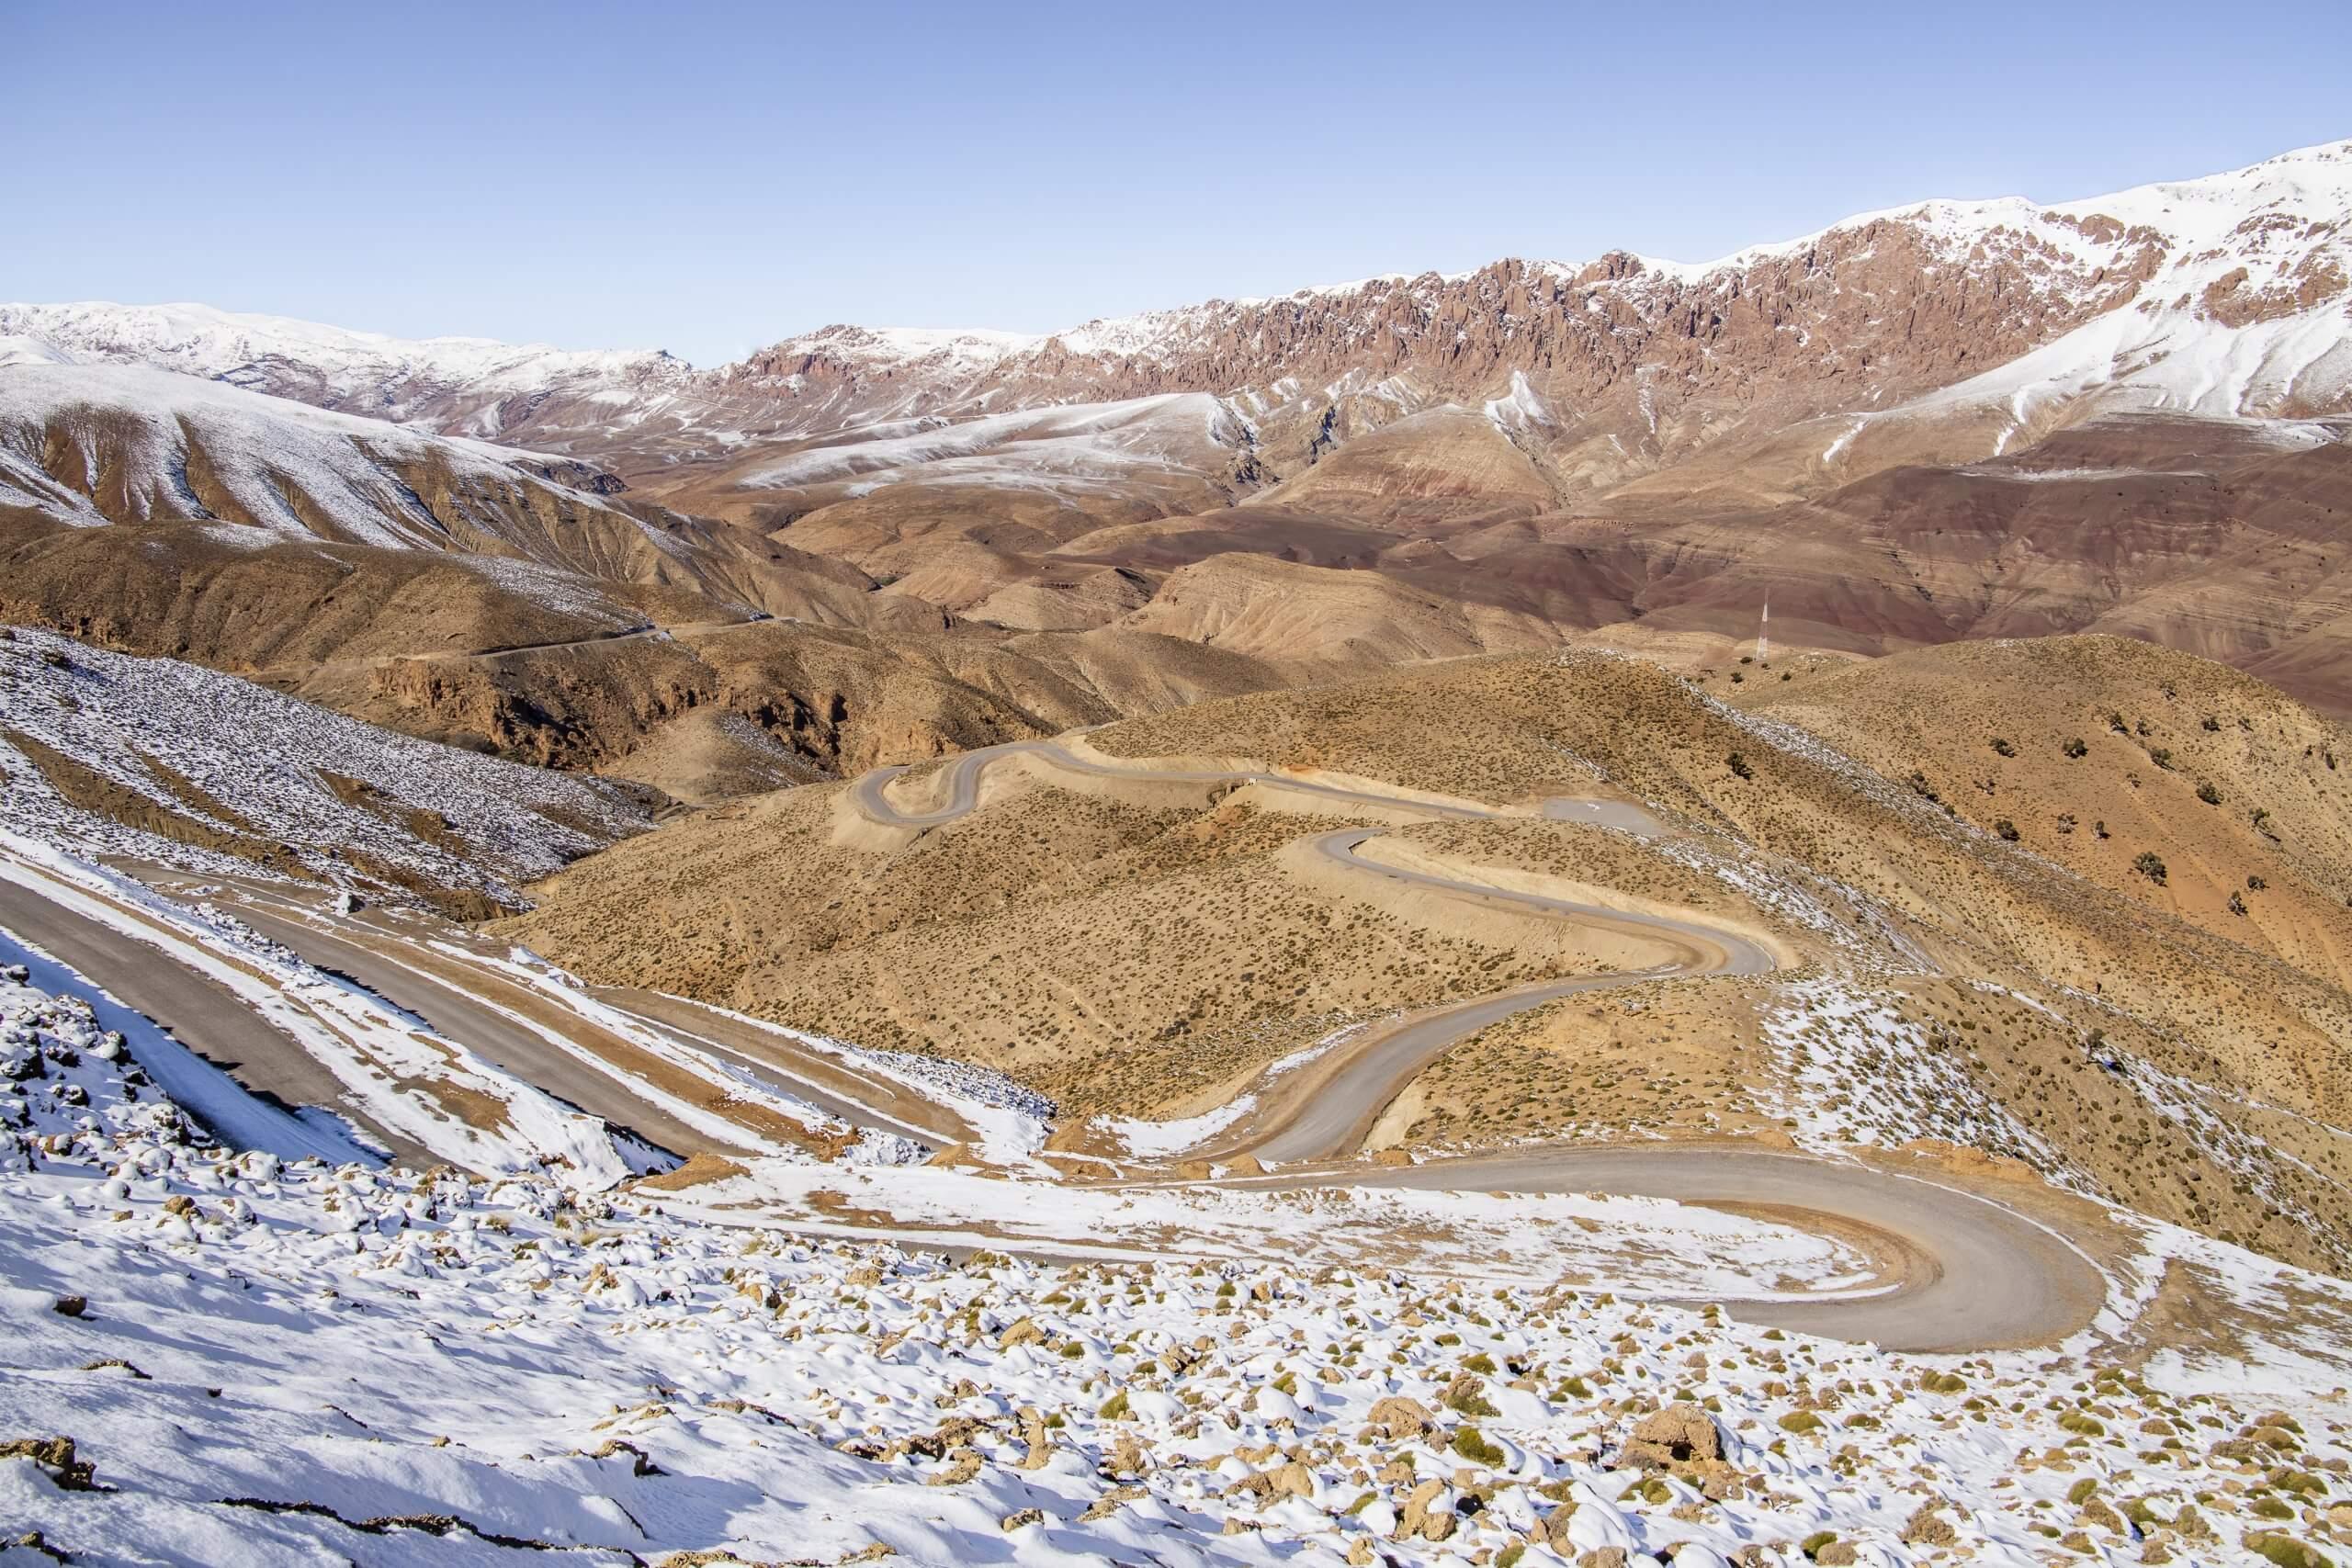 durch die wundervolle Bergwelt des Hohen Atlas